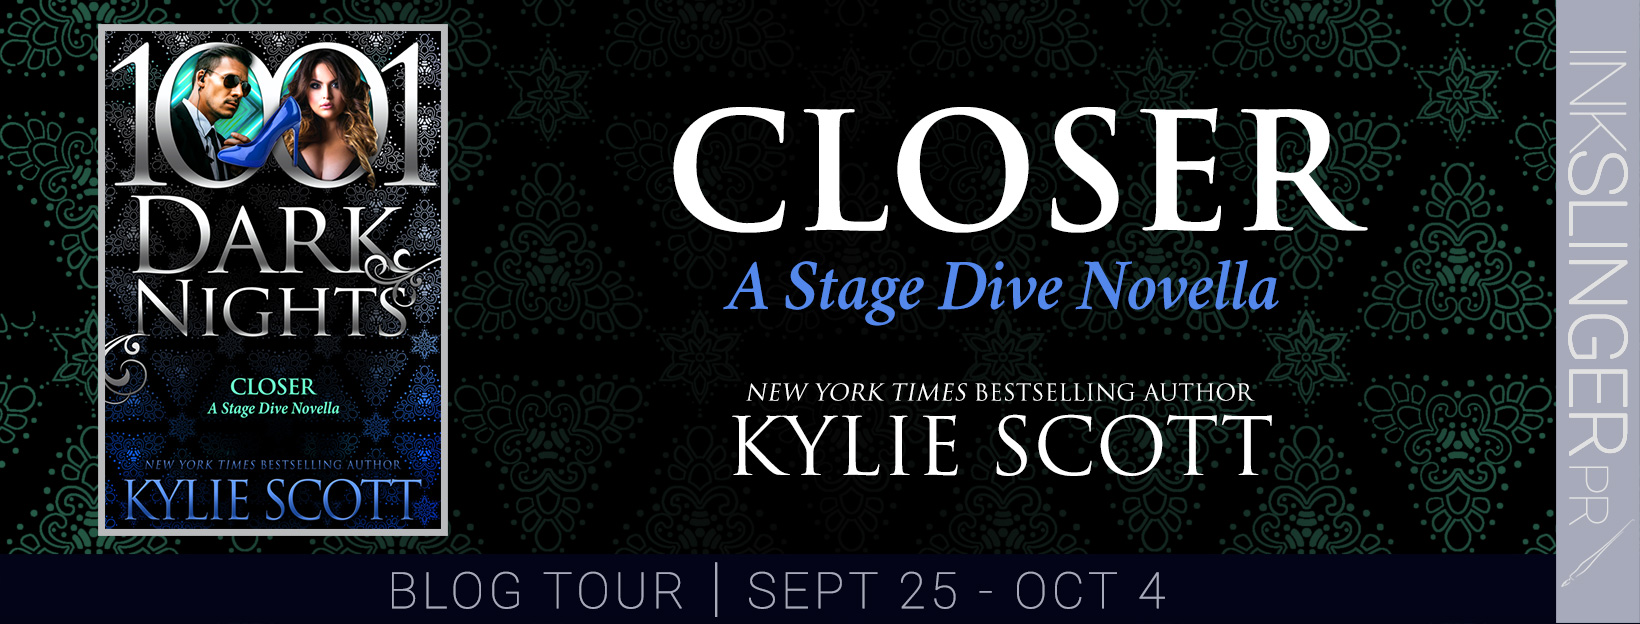 Closer by Kylie Scott